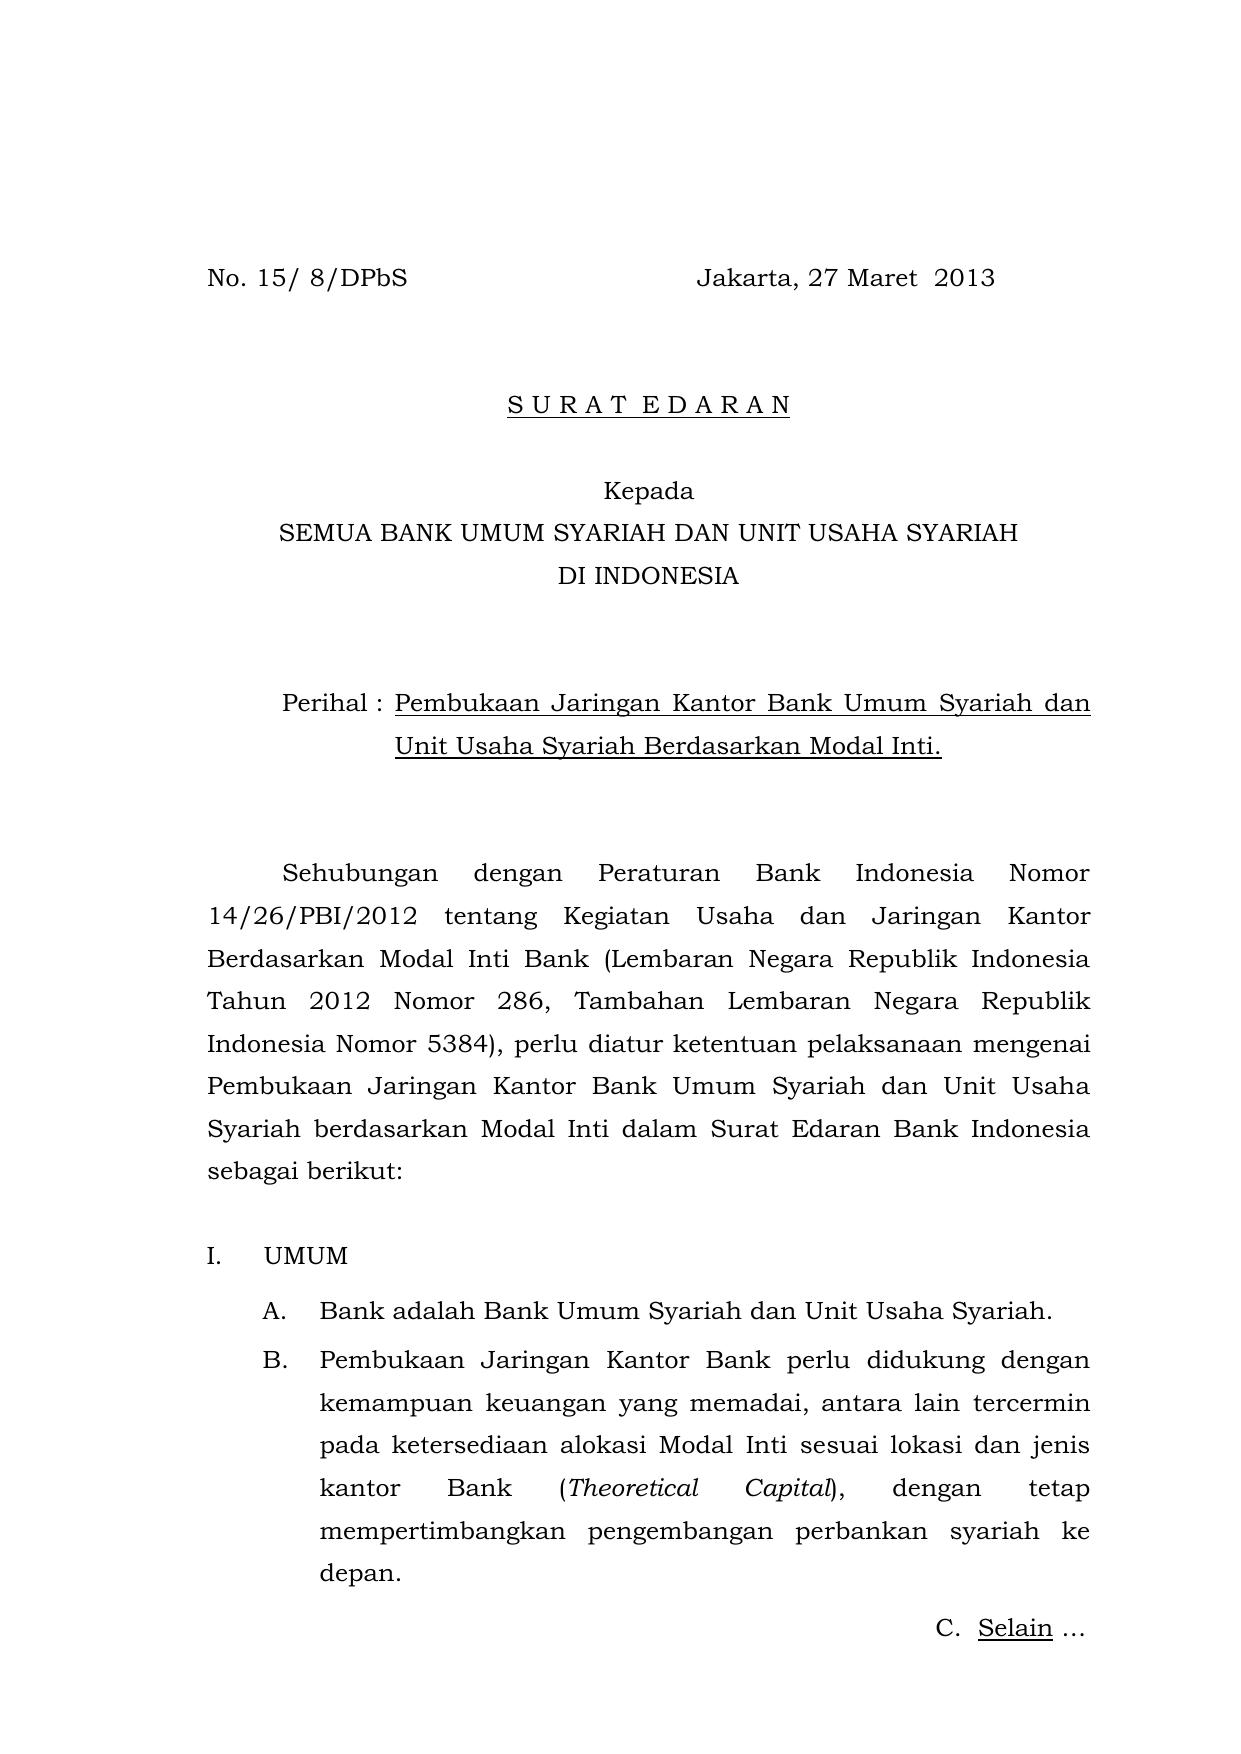 001115200 1 a3e3643e485564b6beeff214119e6220 - Jenis Jenis Kantor Bank Di Indonesia